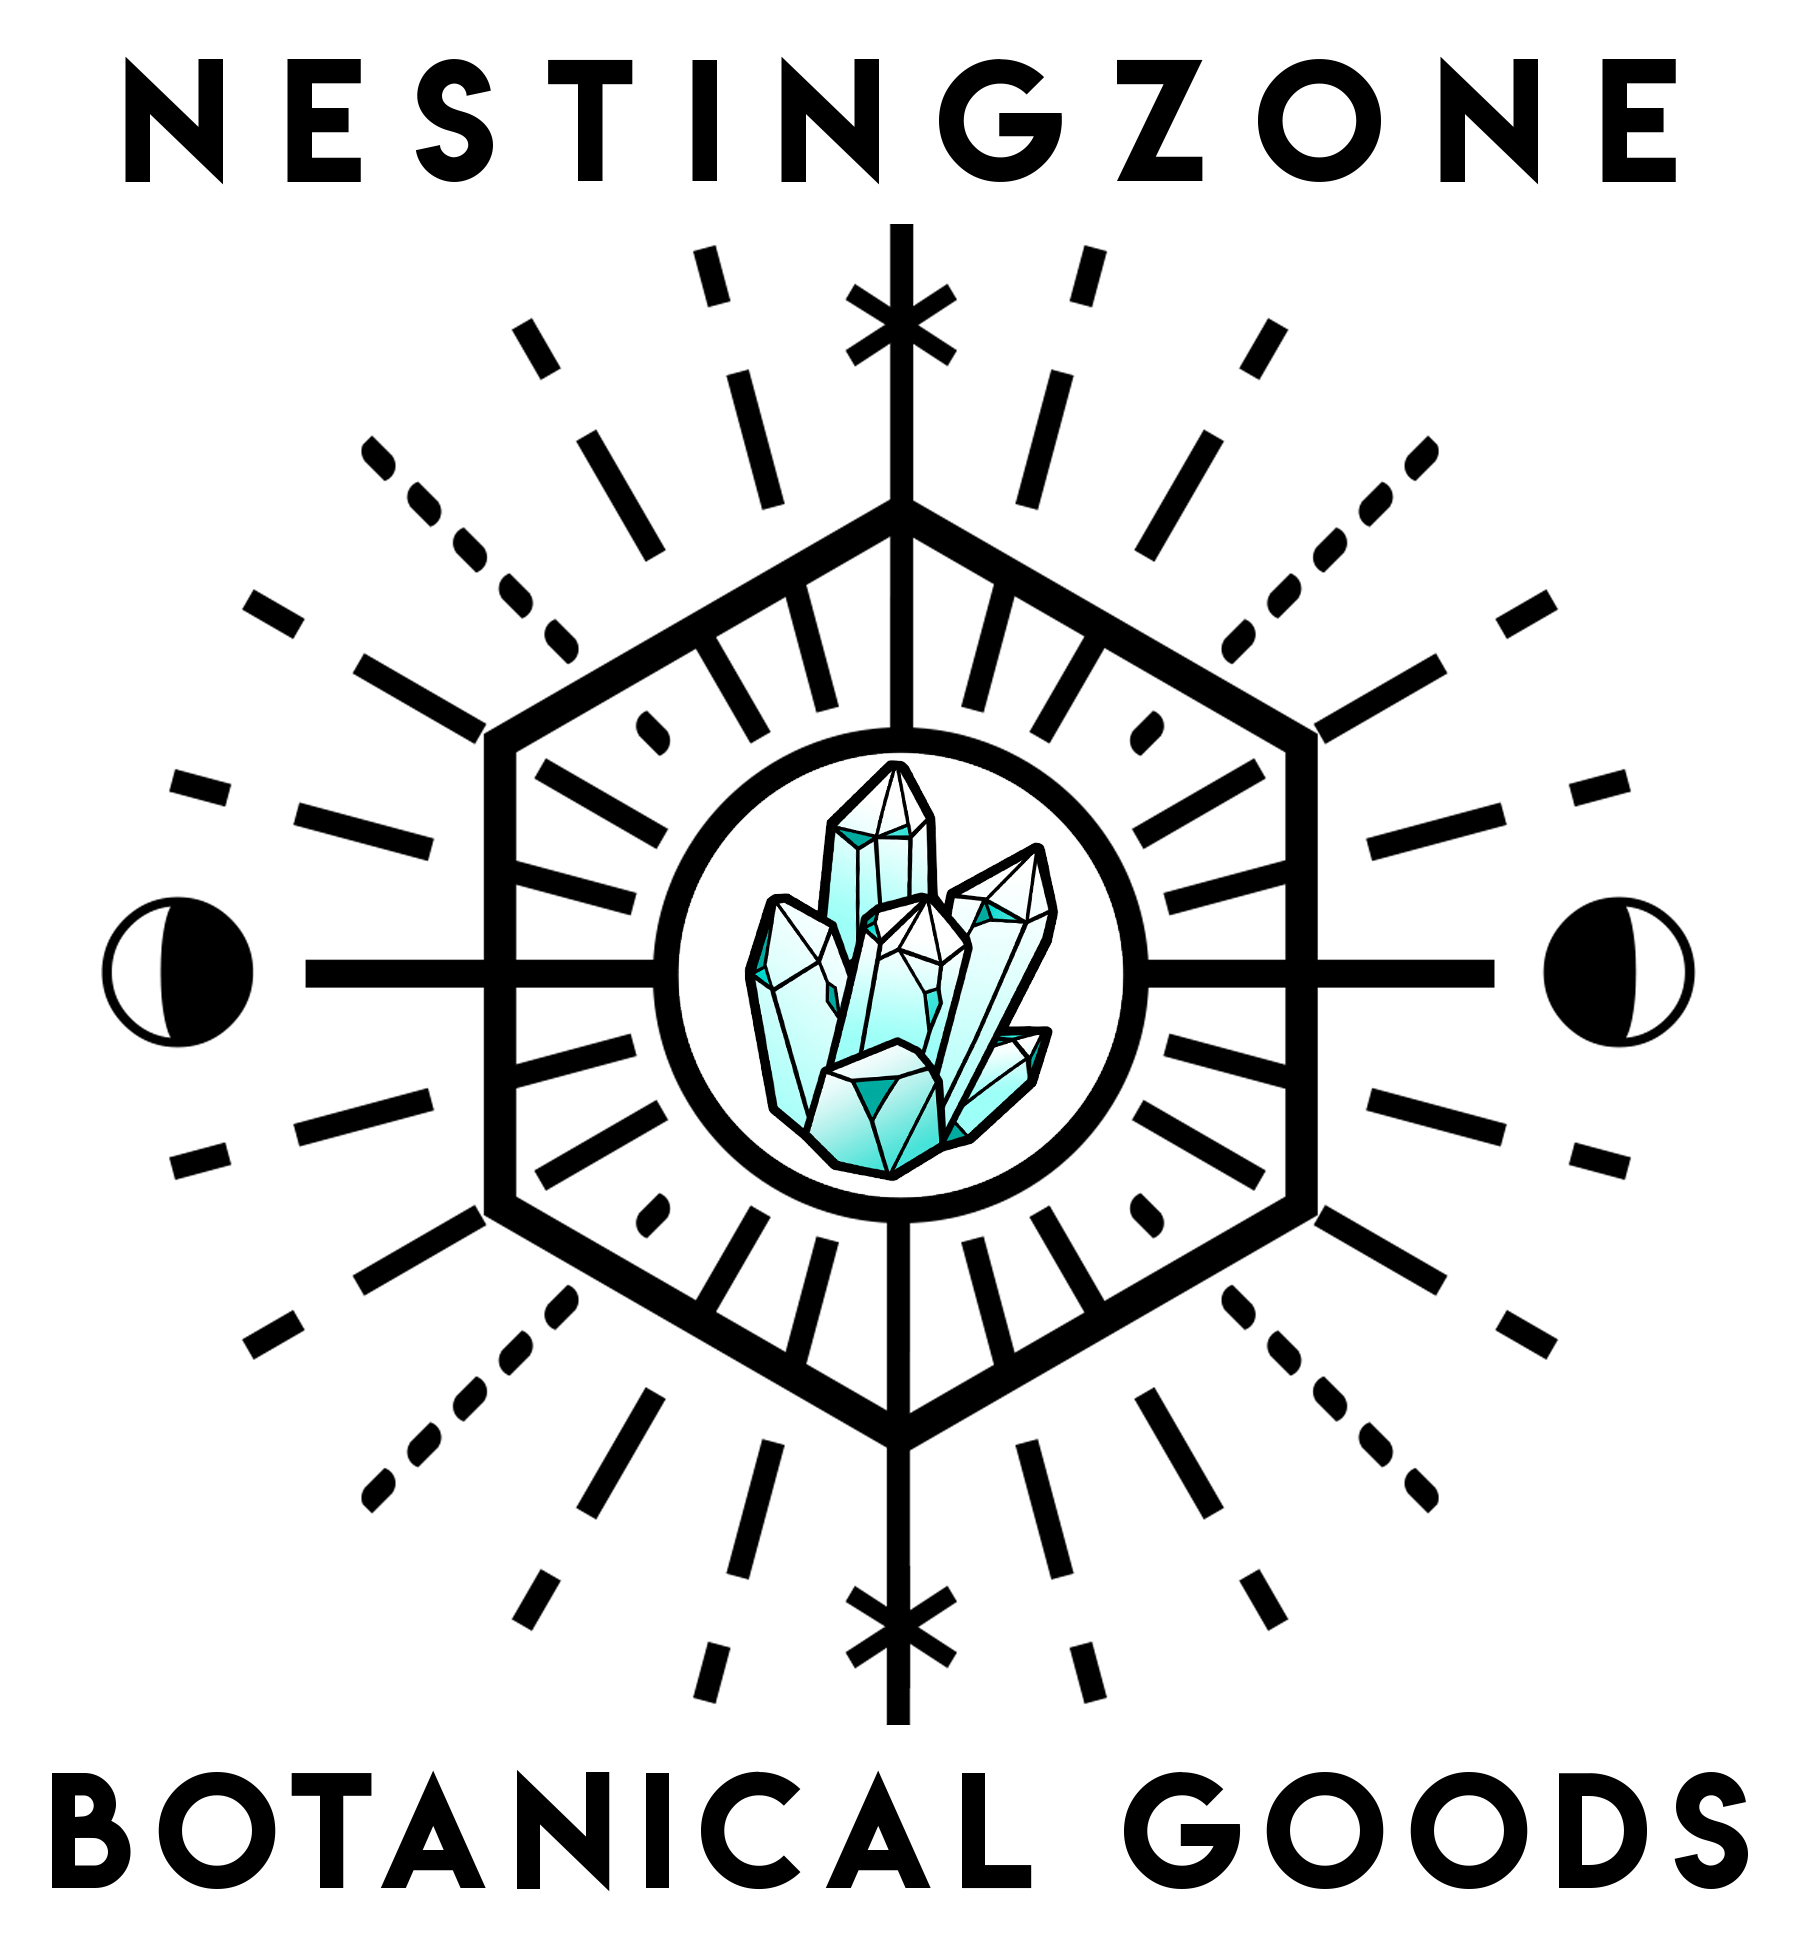 Nestingzone.jpg